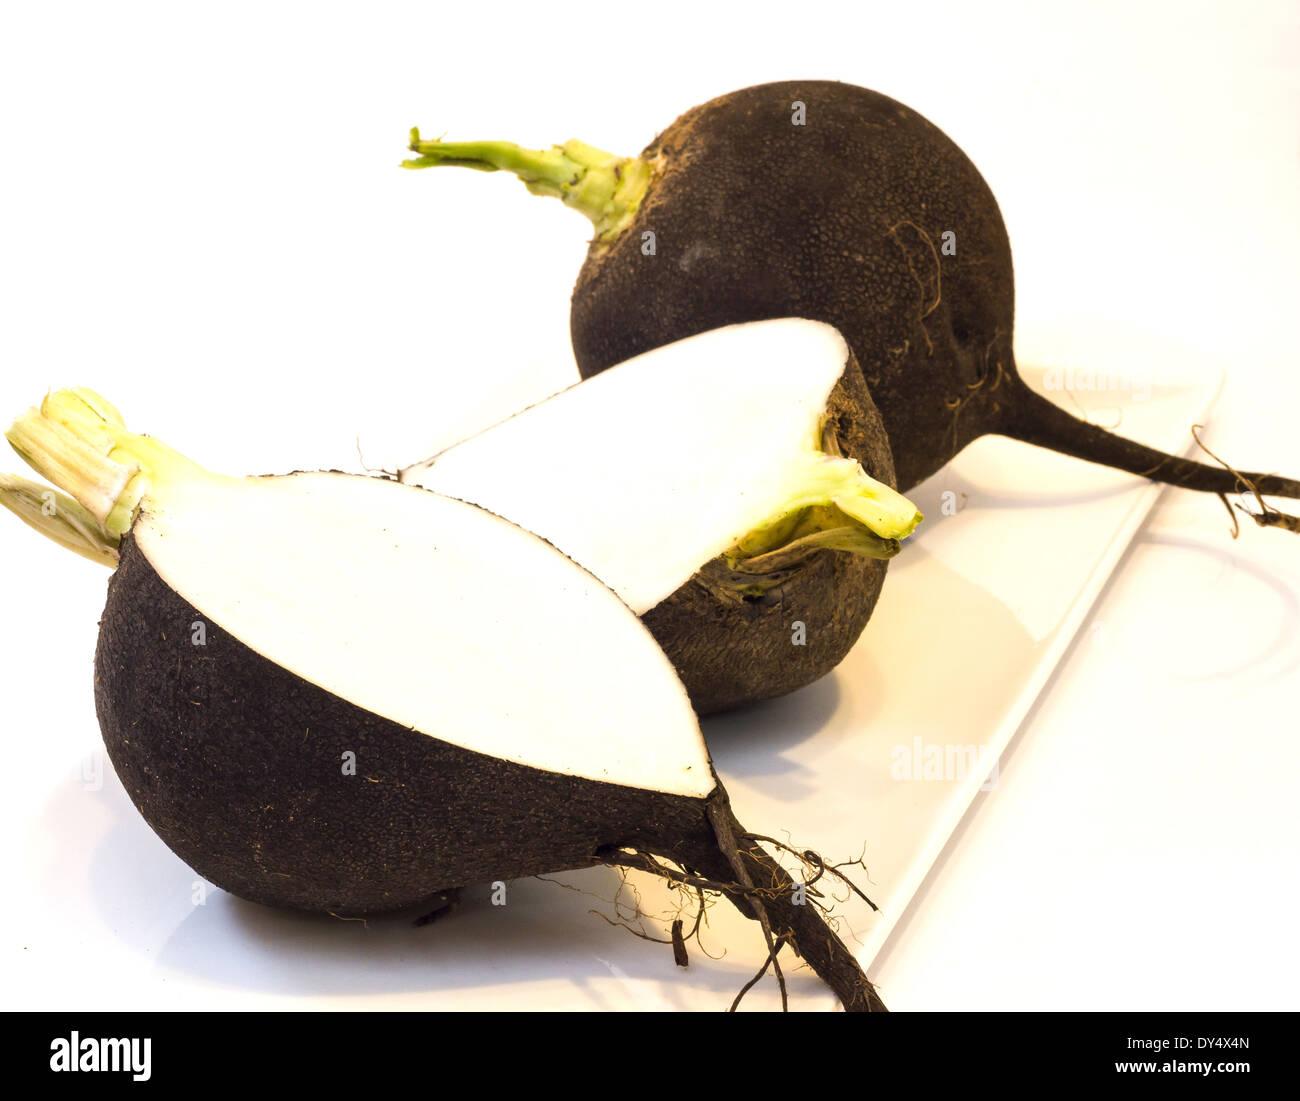 Photo black winter radish on a bright background . - Stock Image